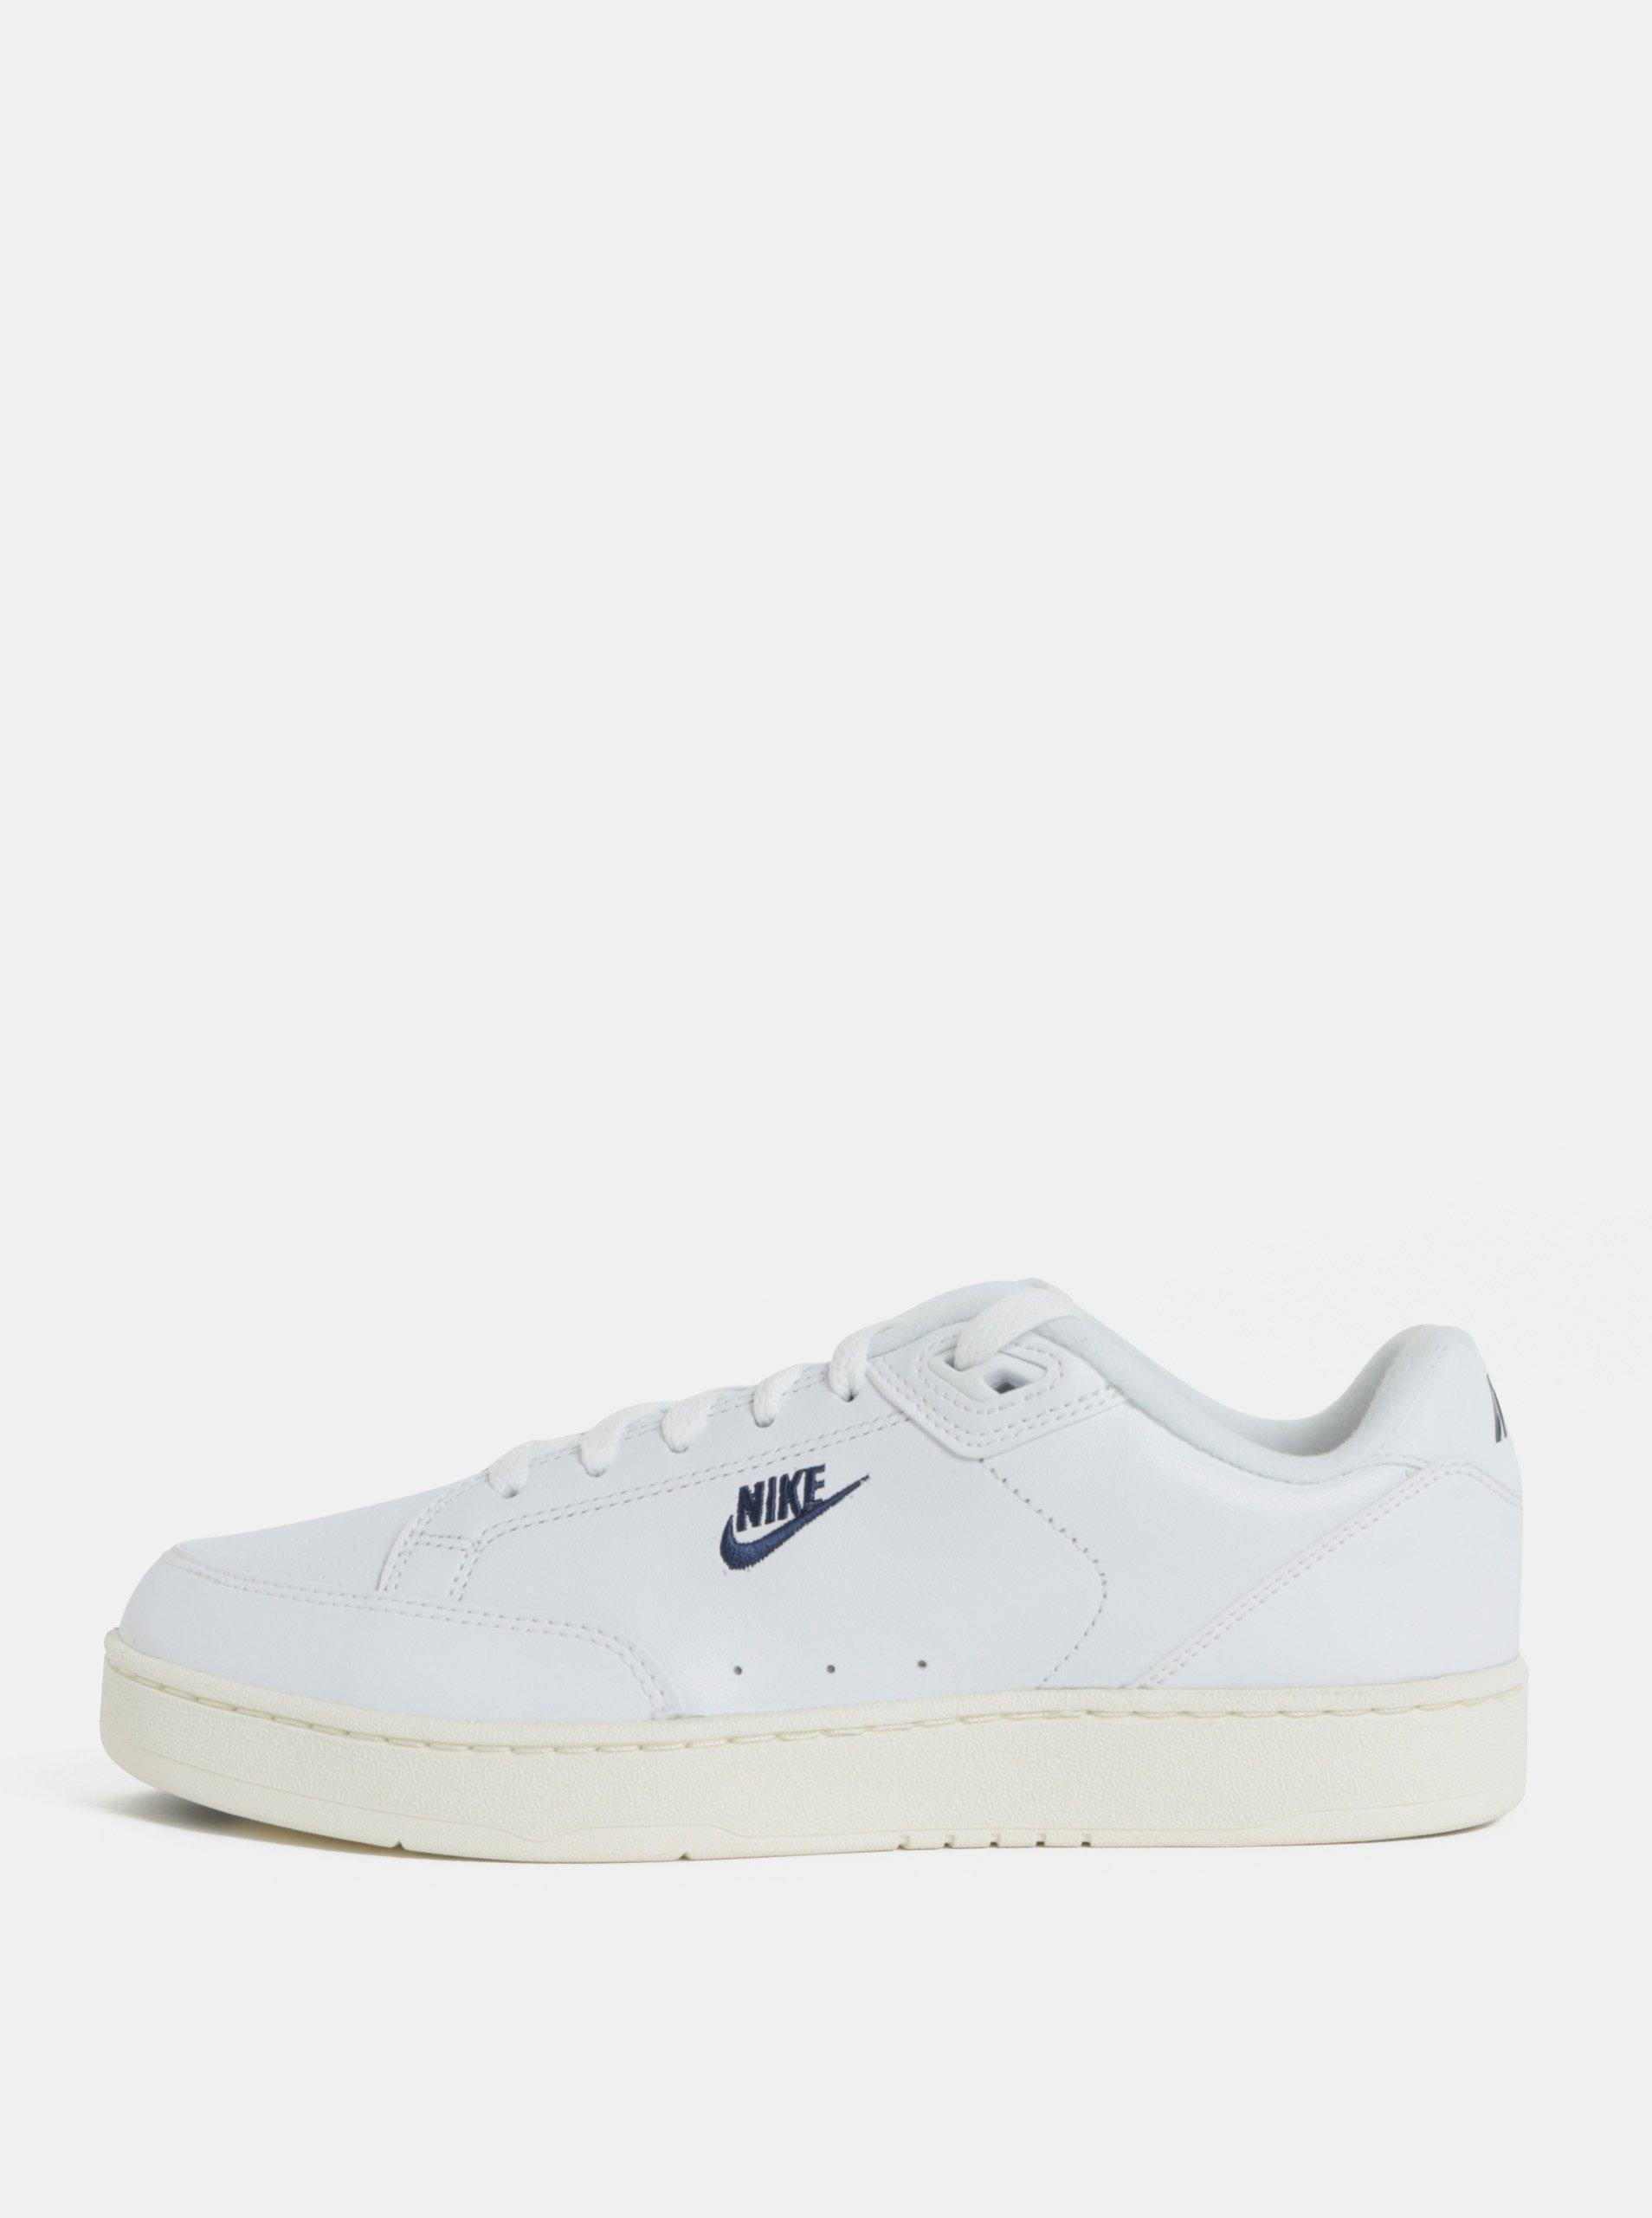 Bílé pánské kožené tenisky Nike Grandstand II 9d2de75a226